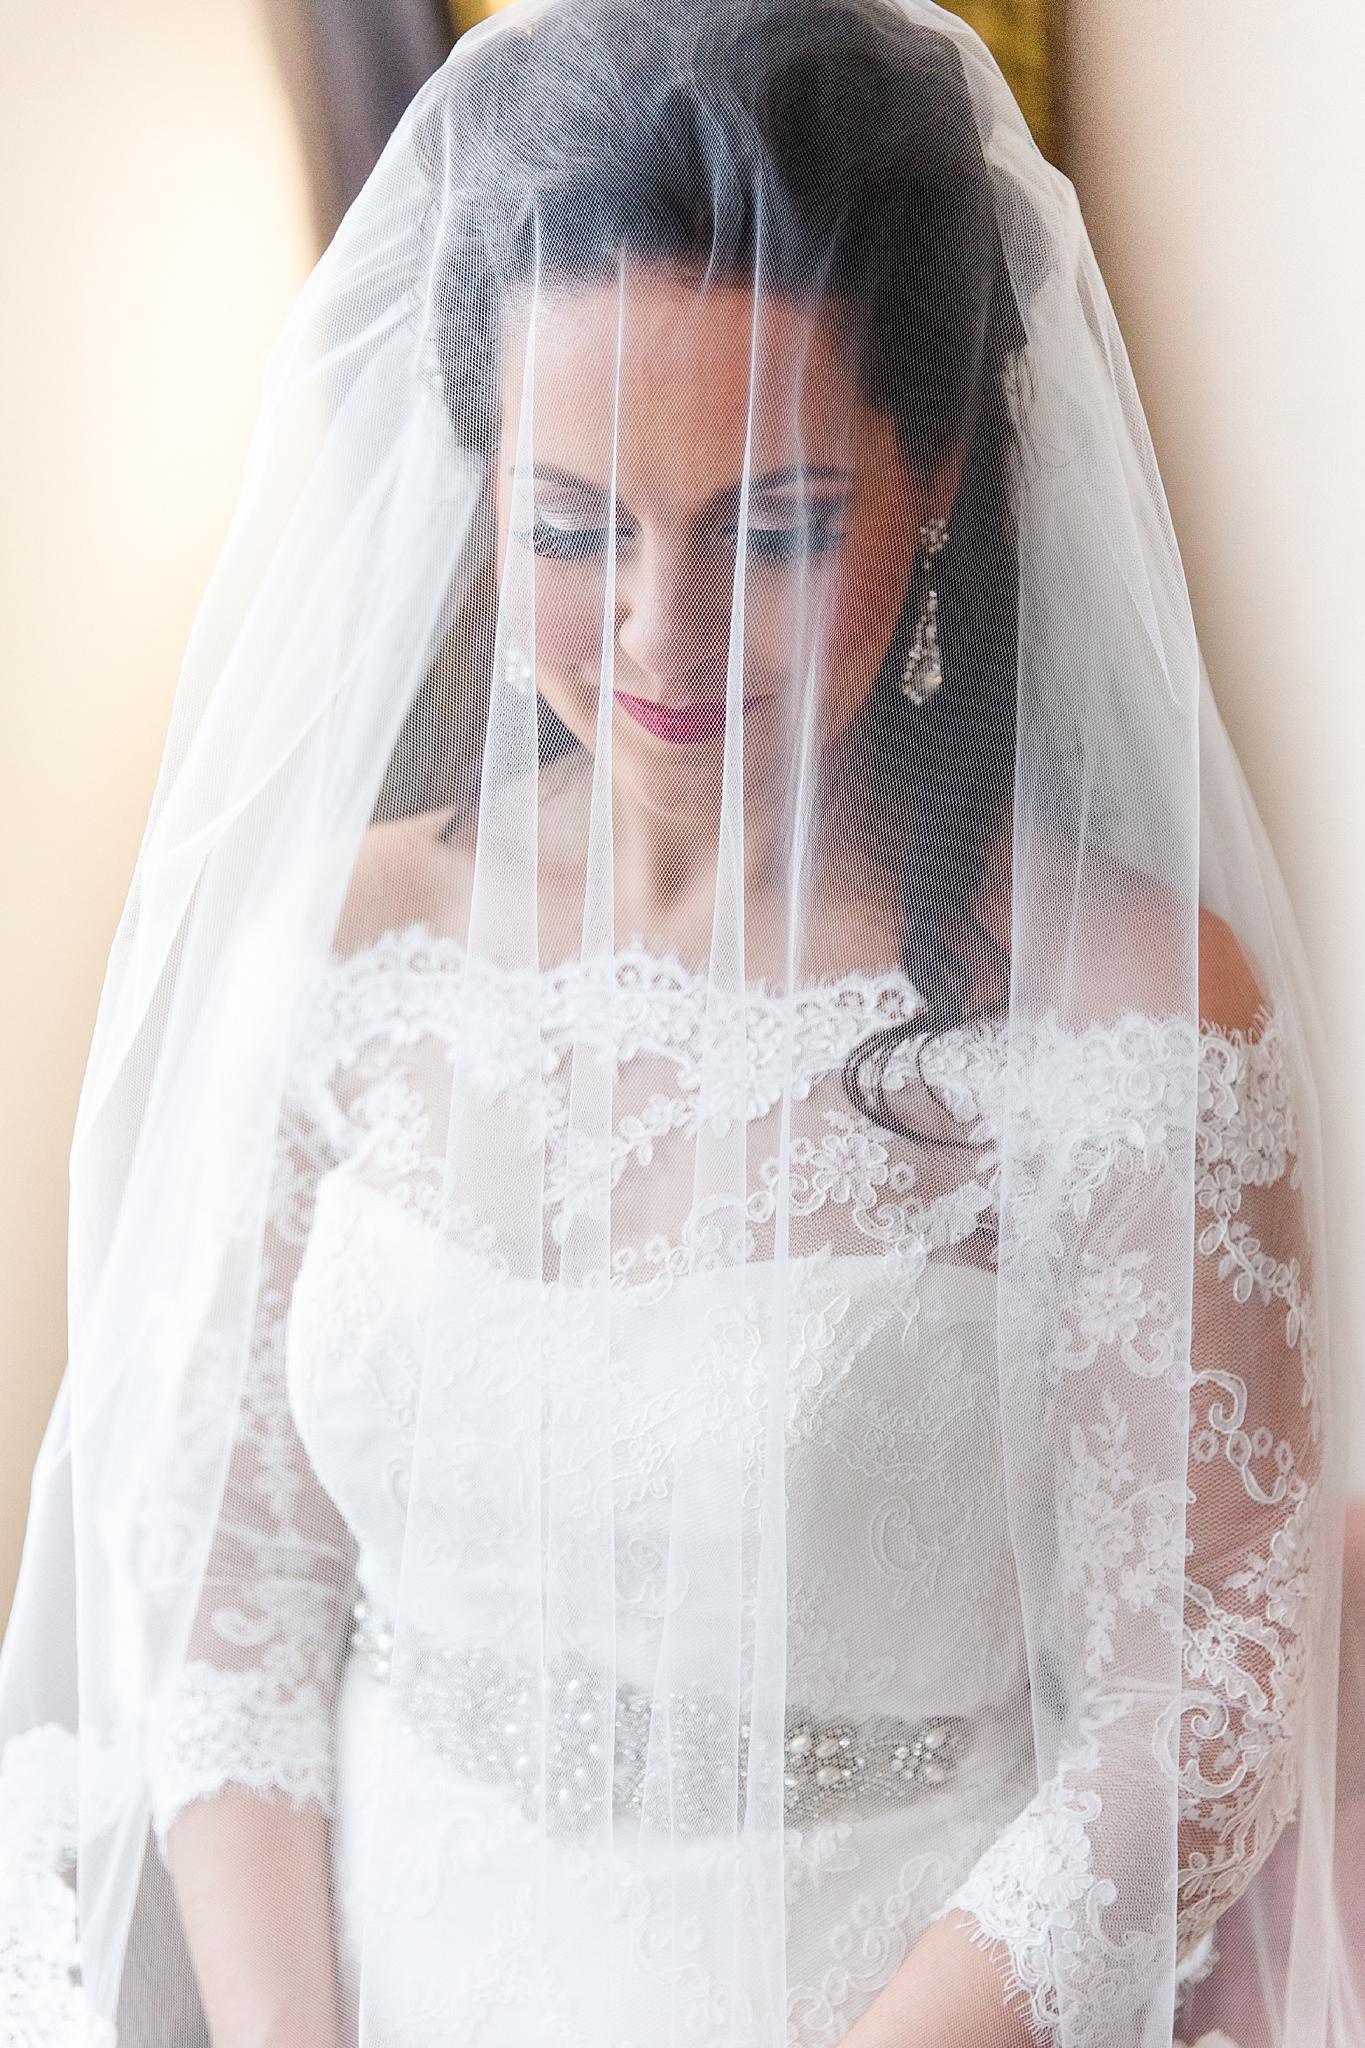 detroit-colony-club-wedding-regal-romantic-photography-in-detroit-mi-by-courtney-carolyn-photography_0009.jpg